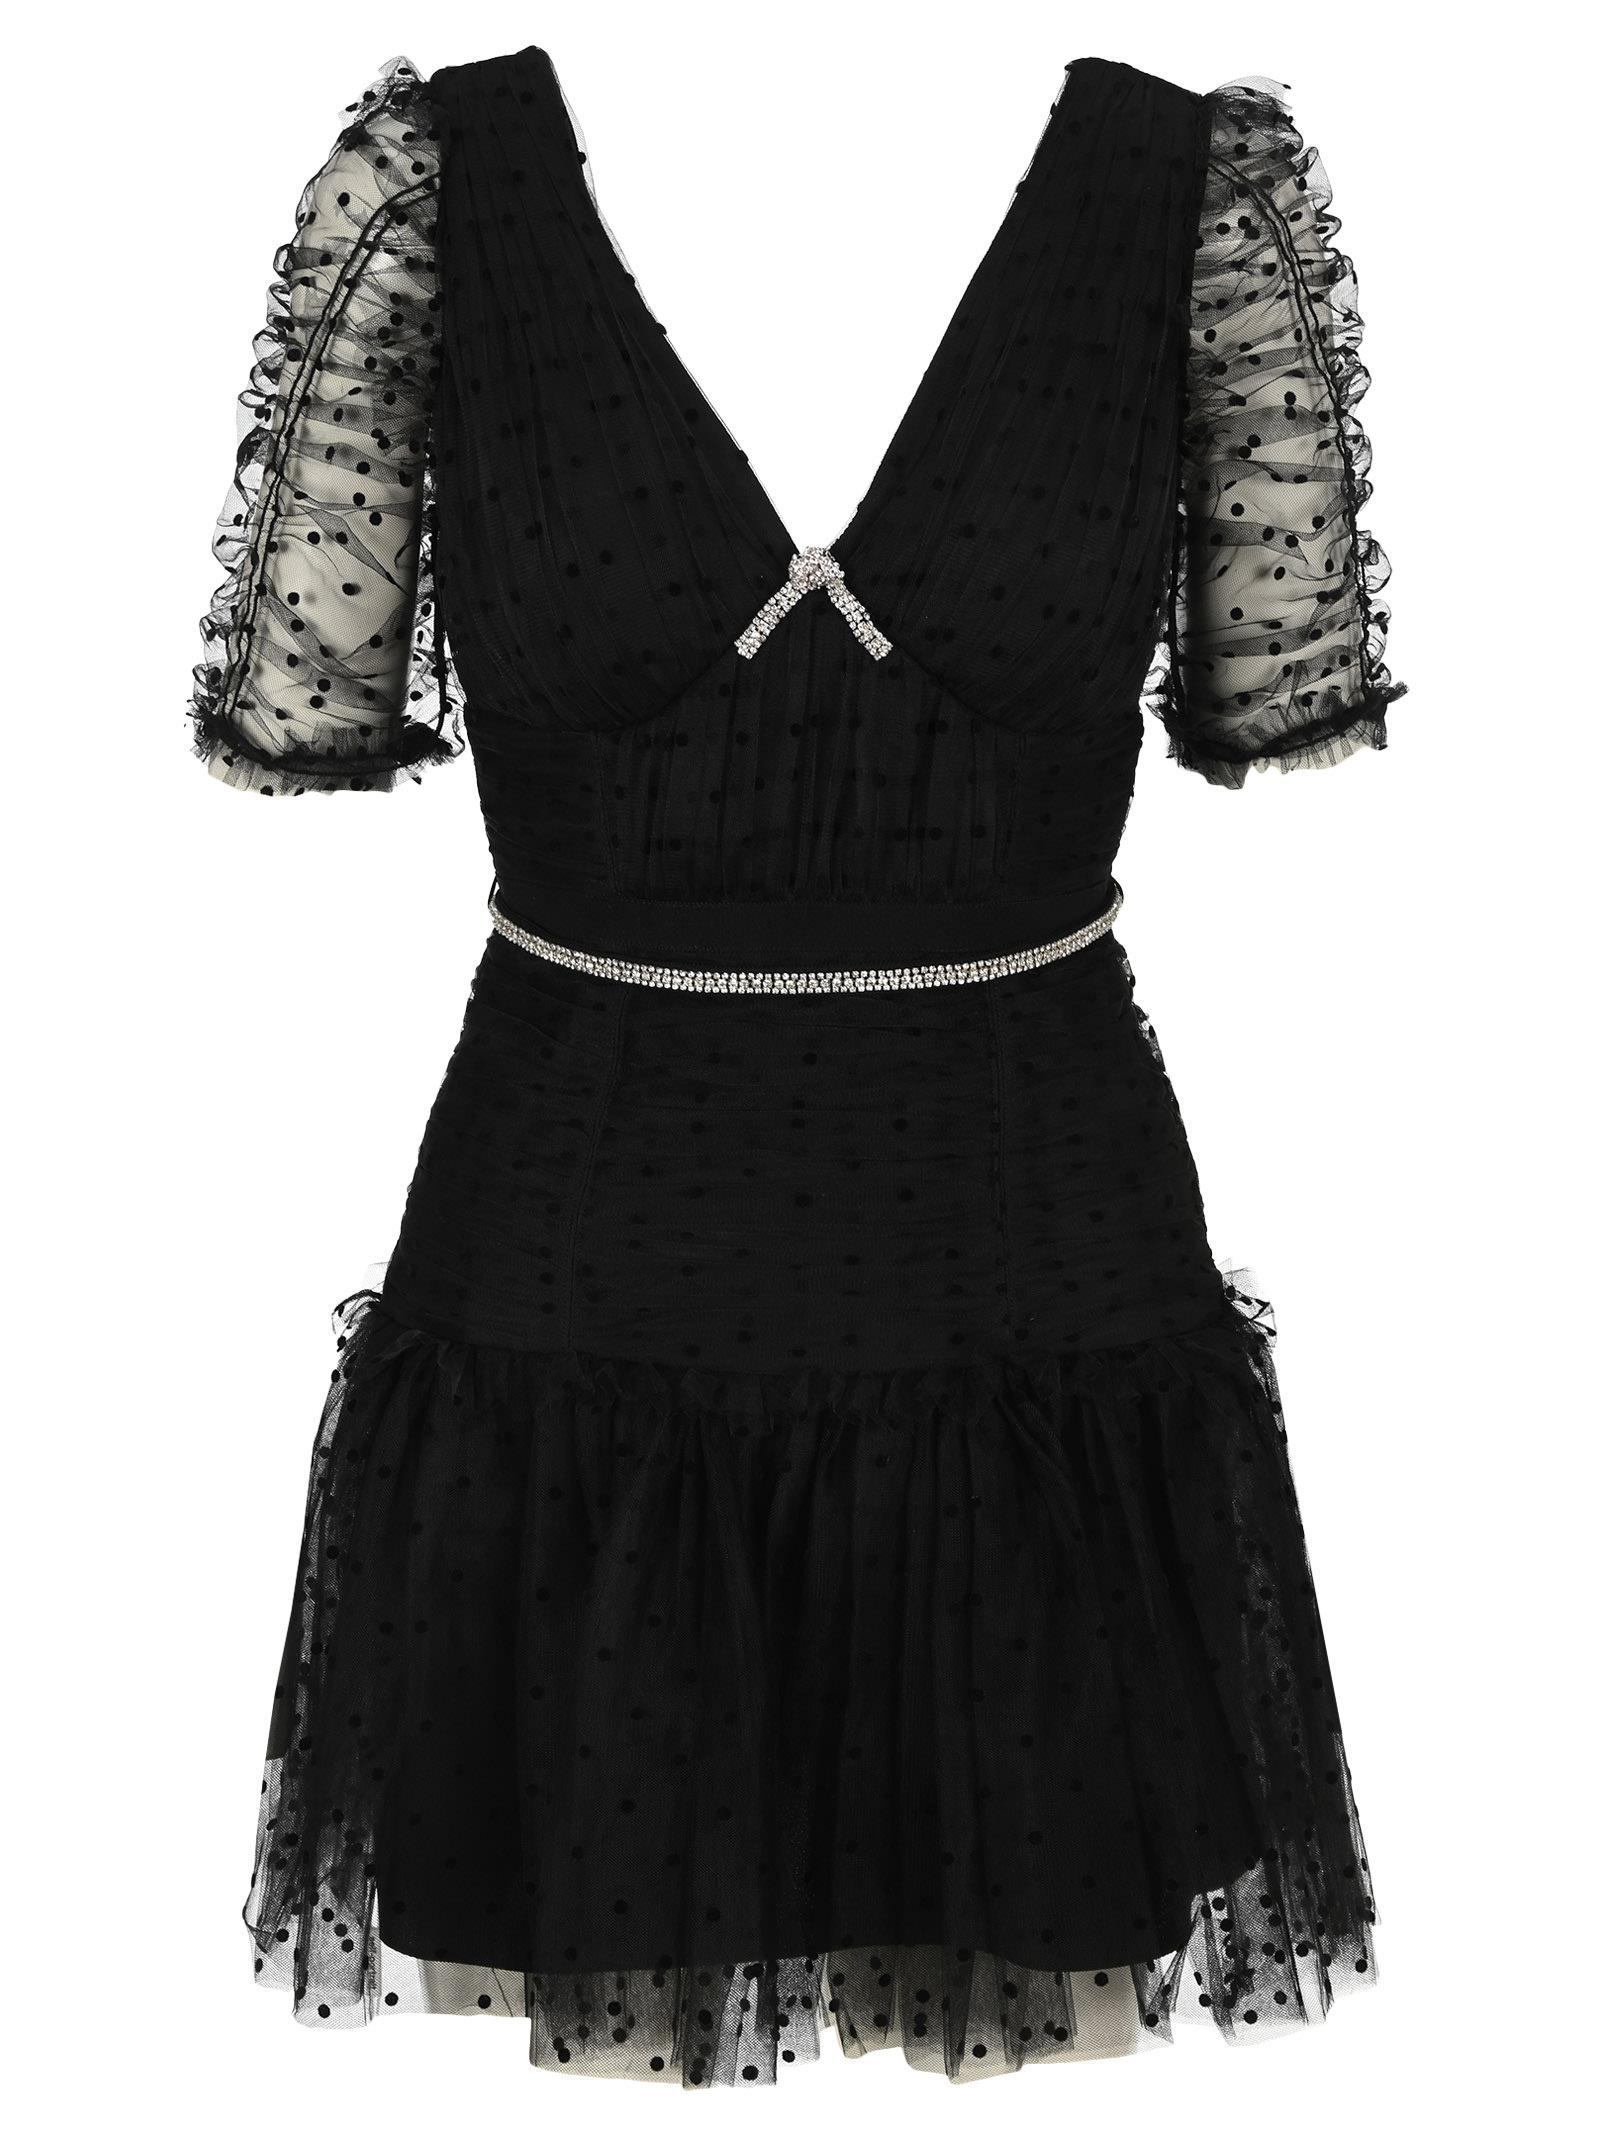 Self-Portrait Clothing SELF PORTRAIT BLACK DOT MESH MINI DRESS